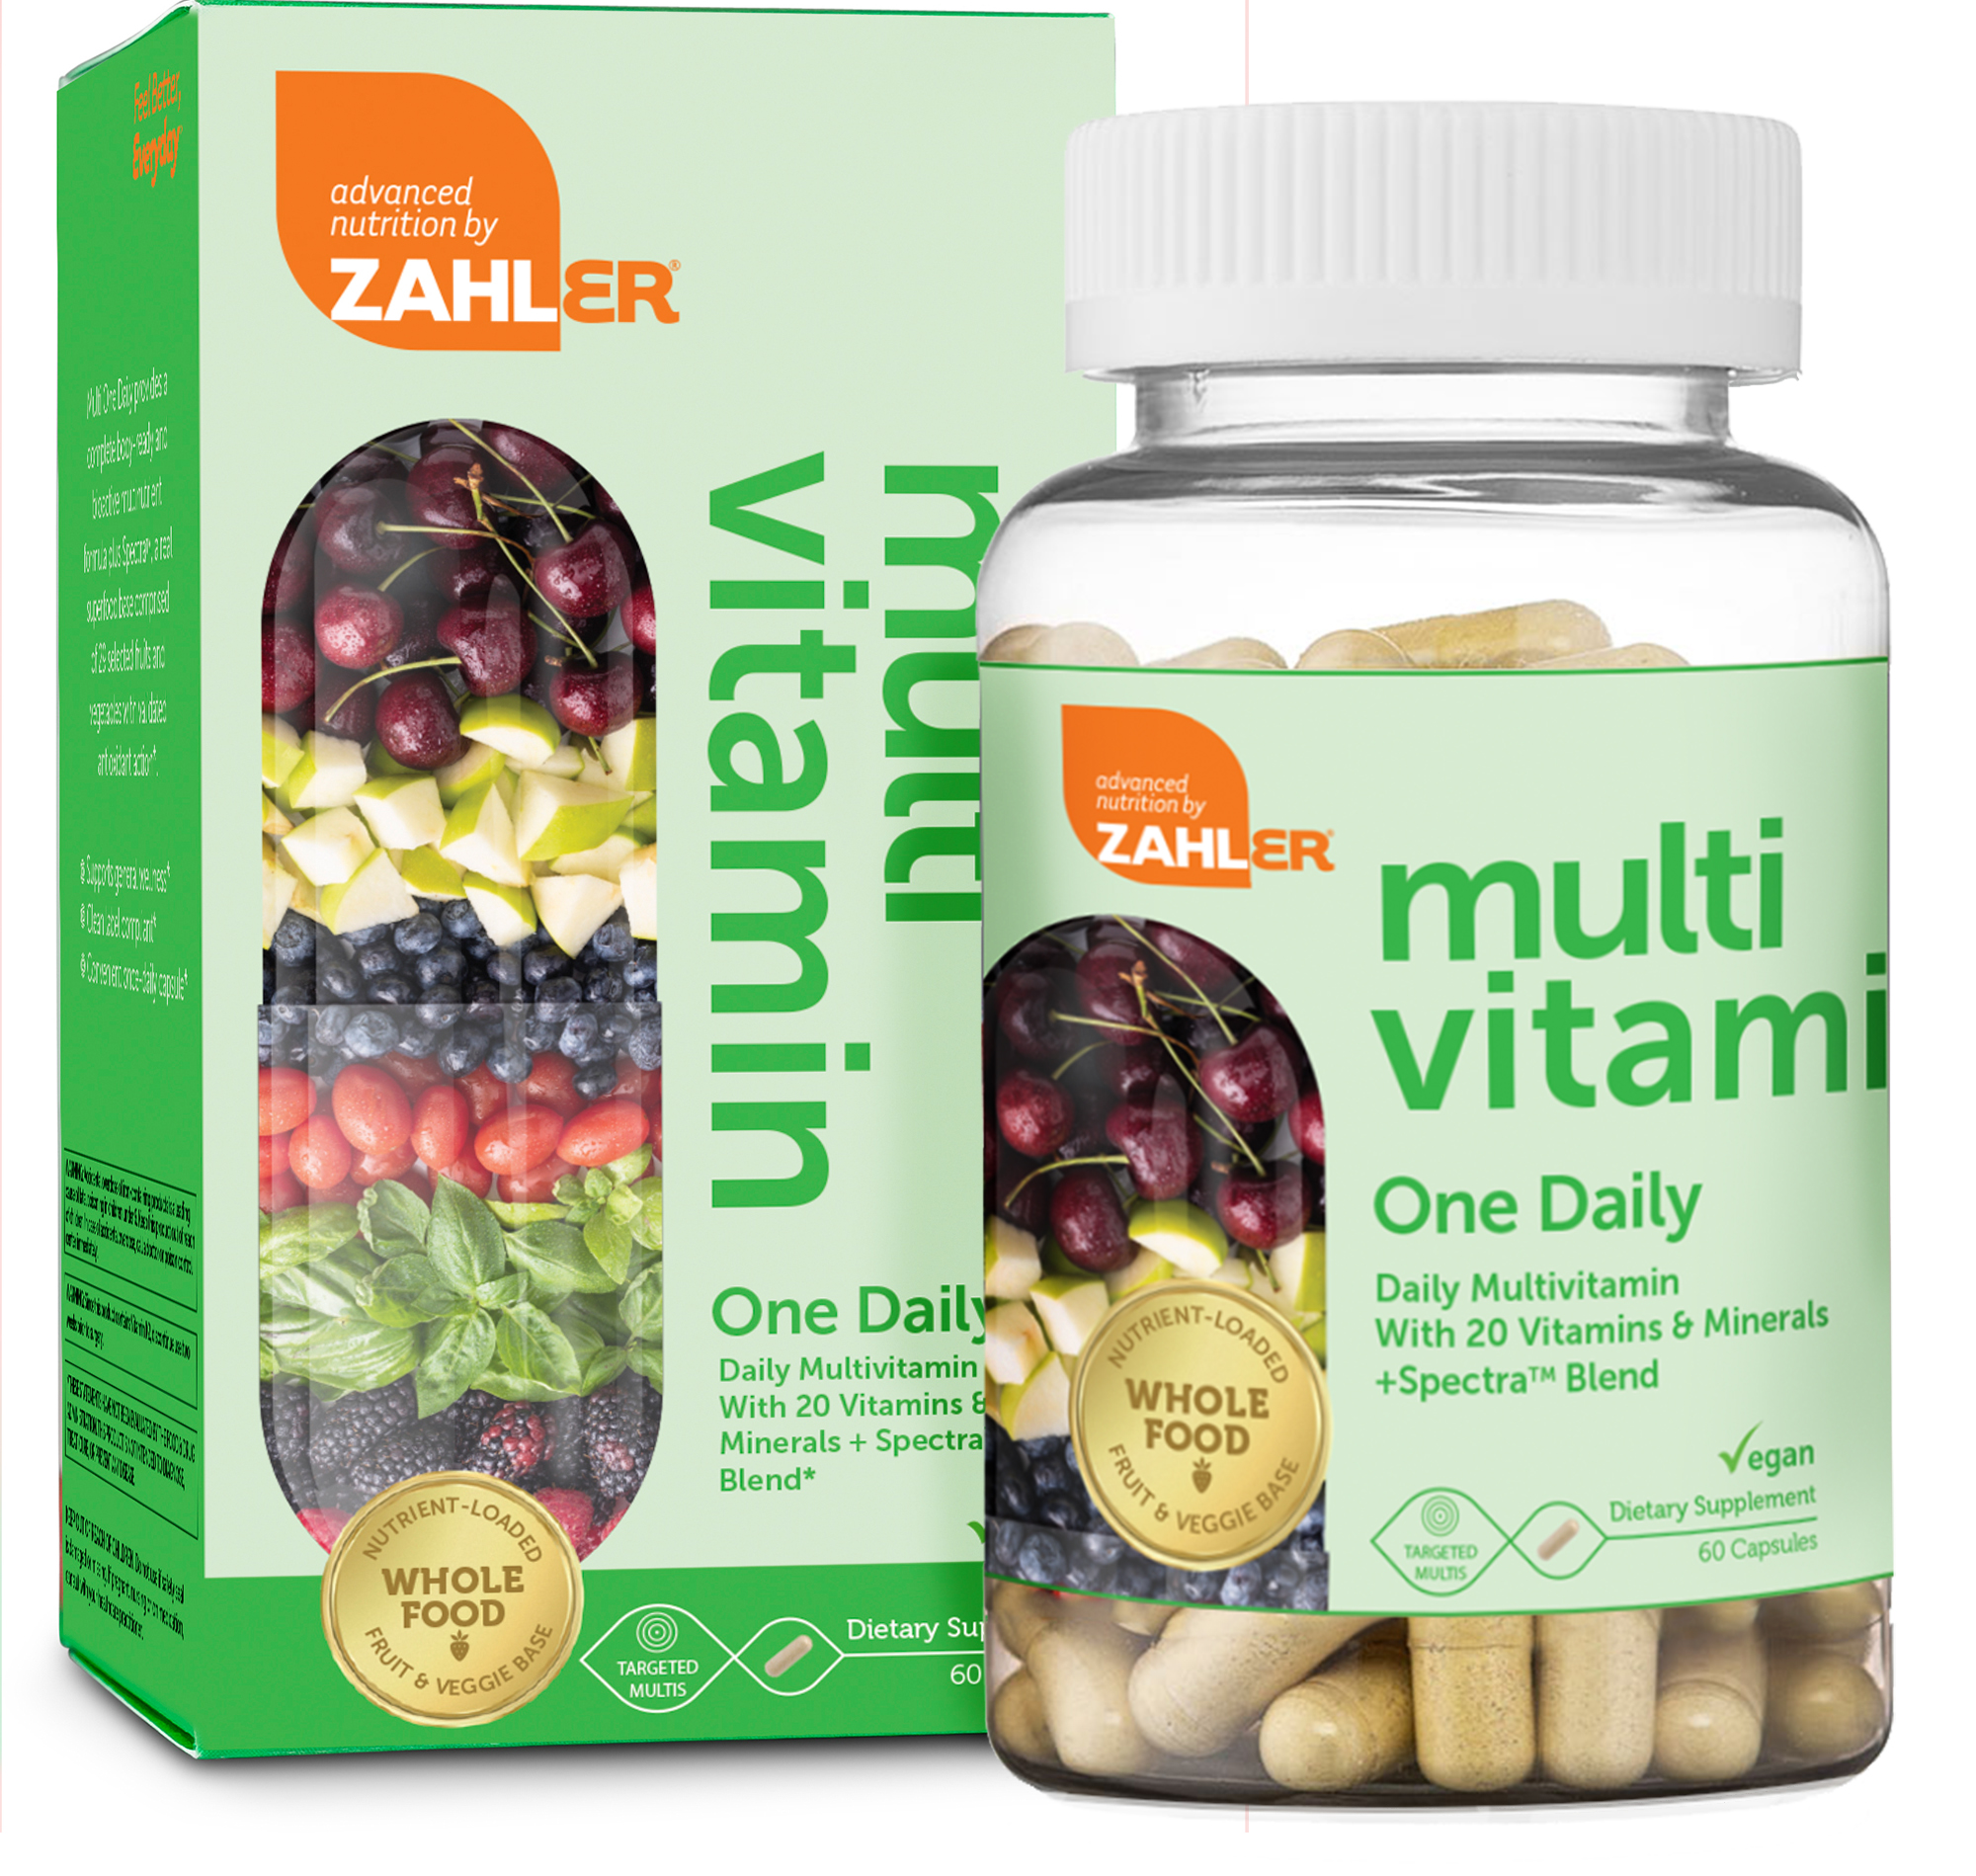 Multivitamin One Daily